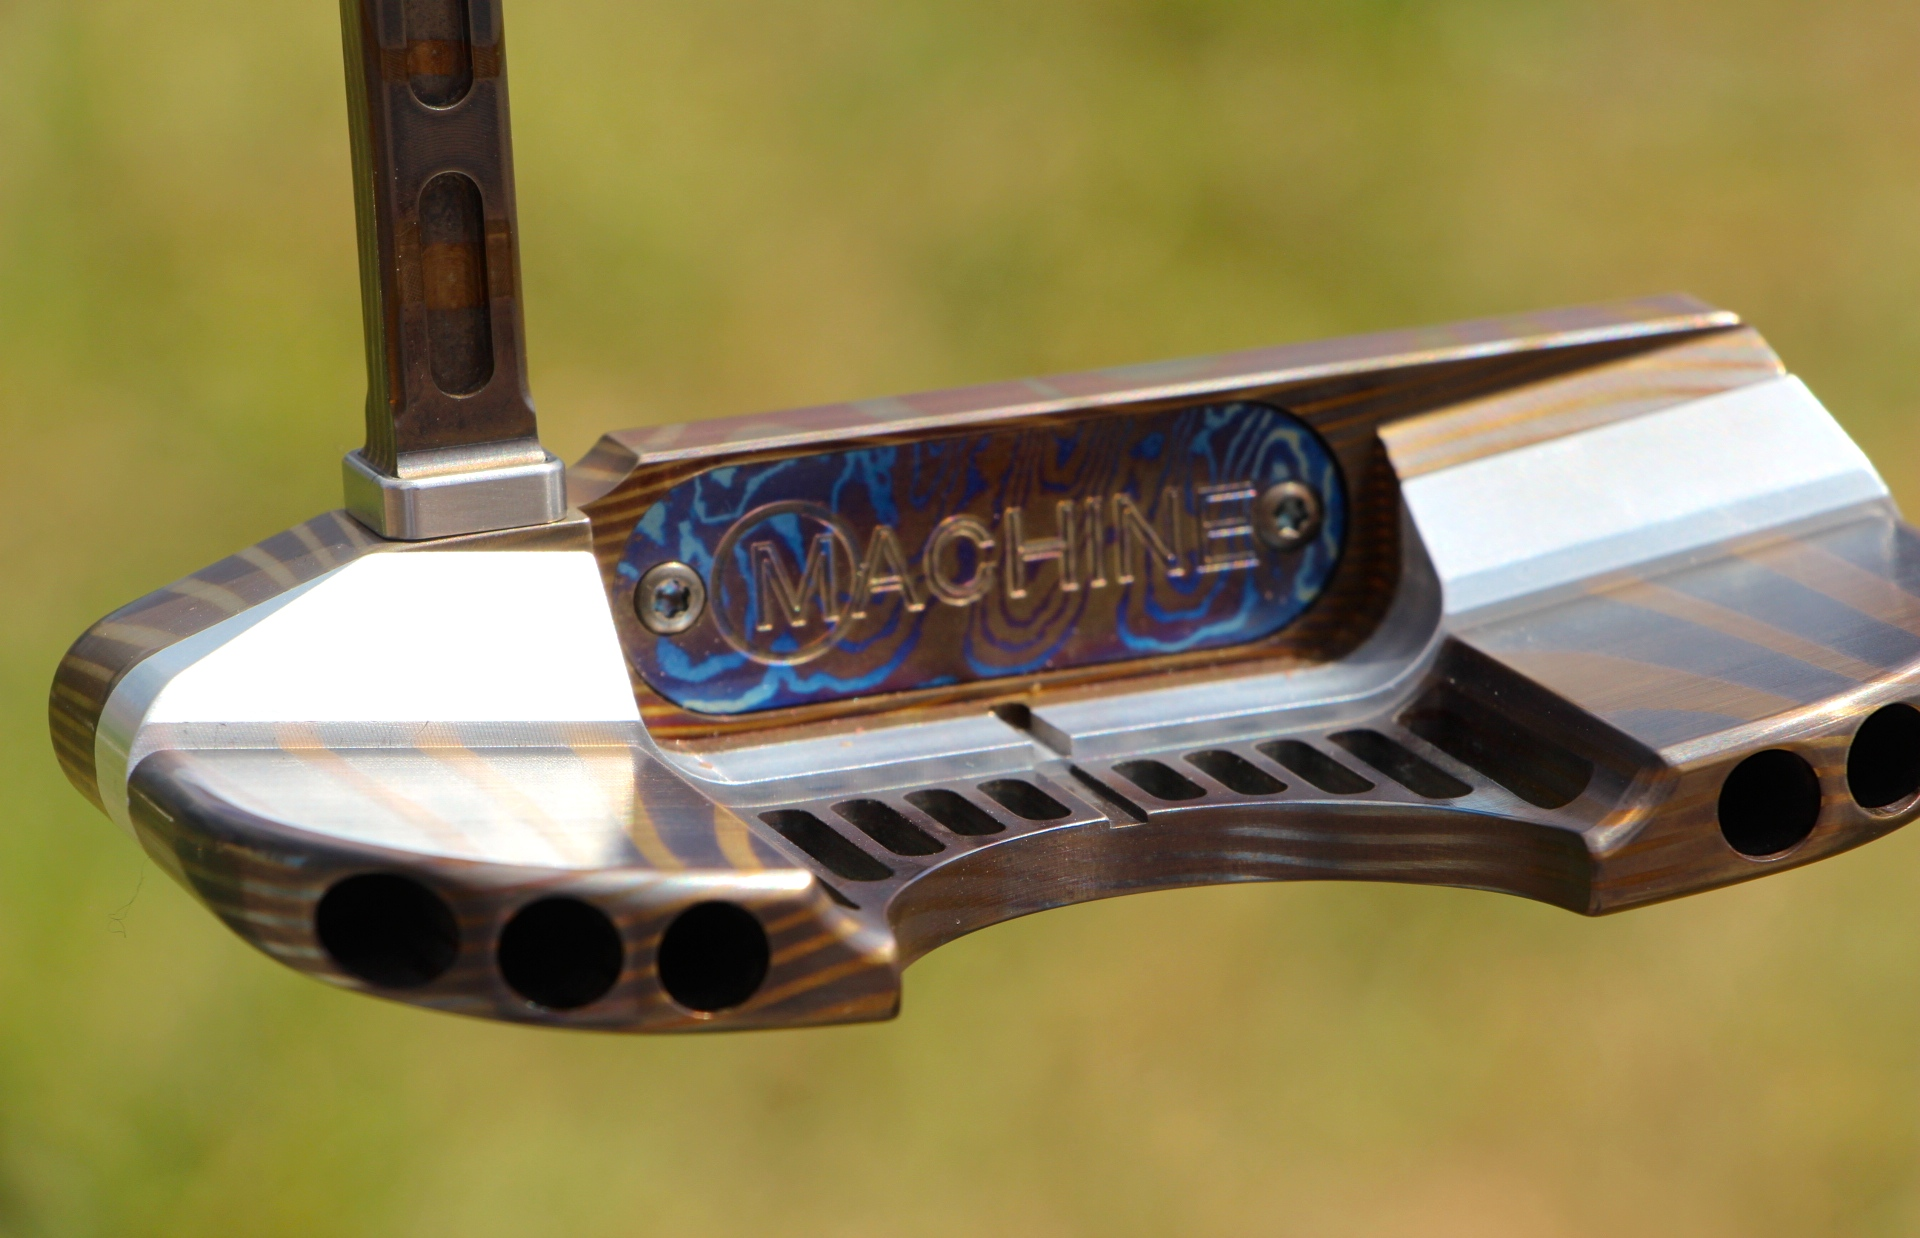 Wrx Custom Putter Showcase Pick The Winner Golfwrx